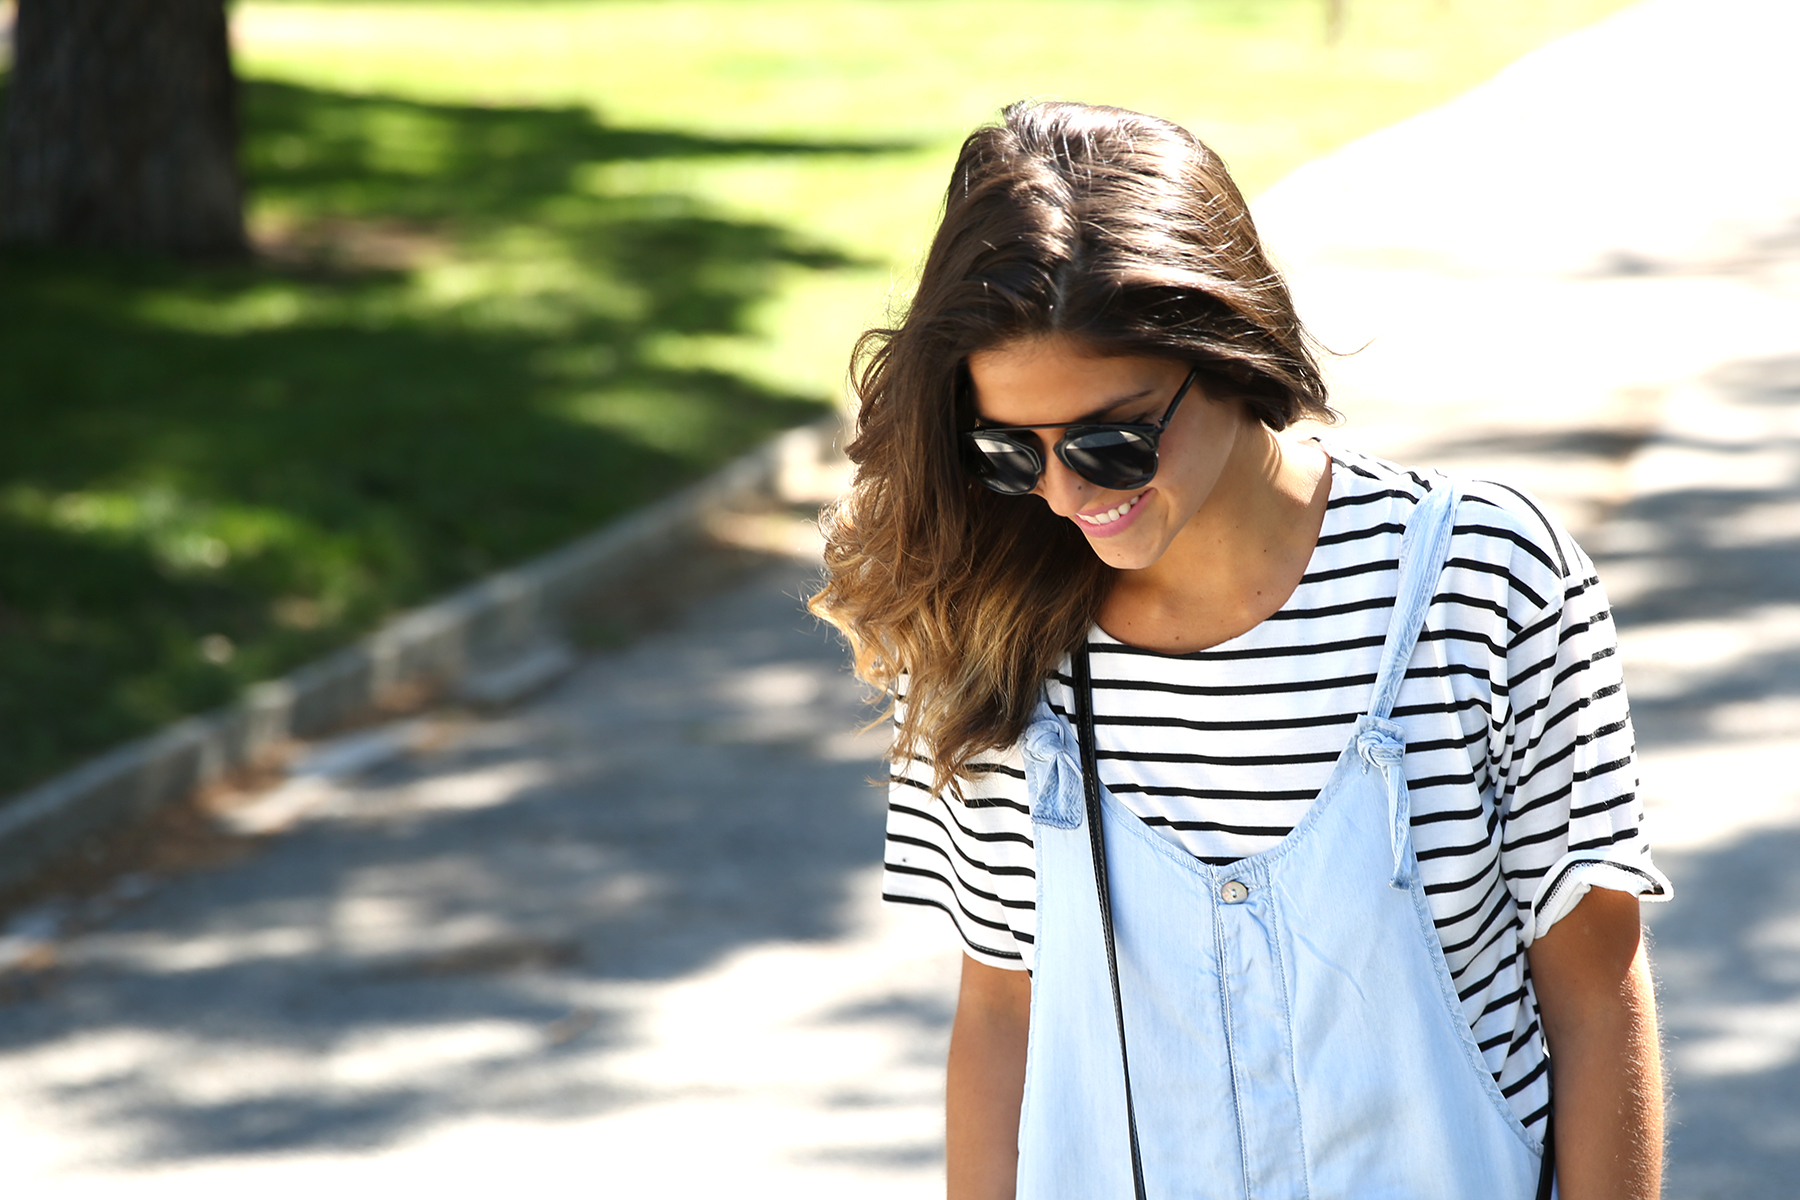 trendy_taste-look-outfit-street_style-ootd-blog-blogger-fashion_spain-vaquero_claro-peto_vaquero-tirantes-striped_tee-camiseta_rayas-marinero-dior_sunnies-gaimo-2